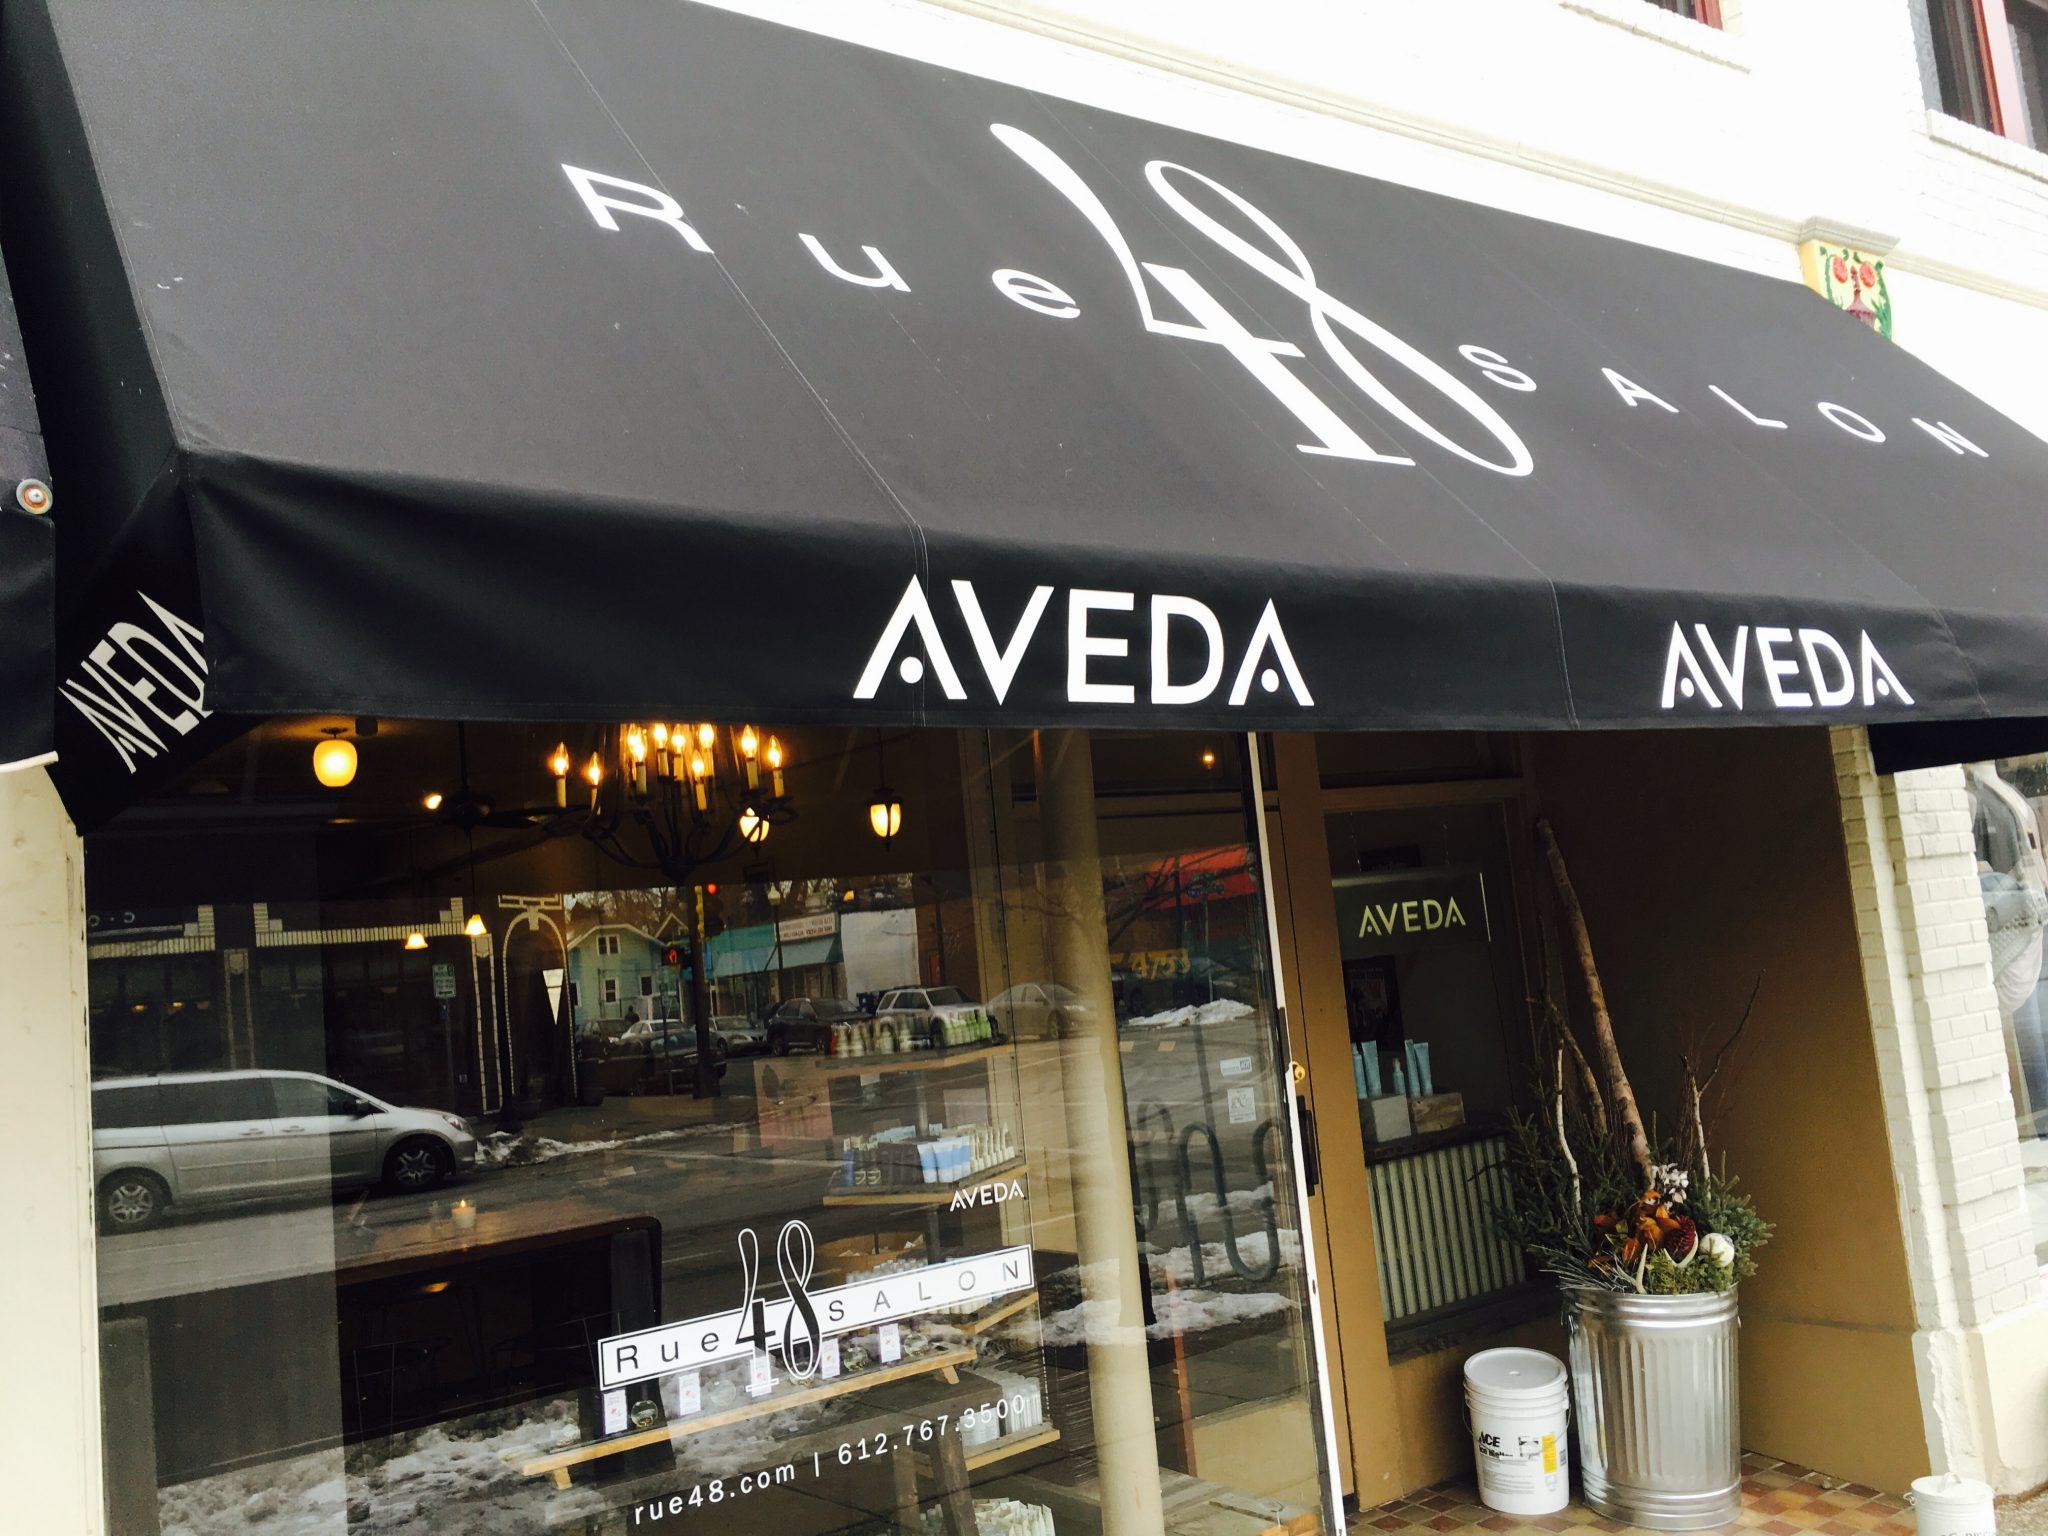 Awning of Rue48 Salon